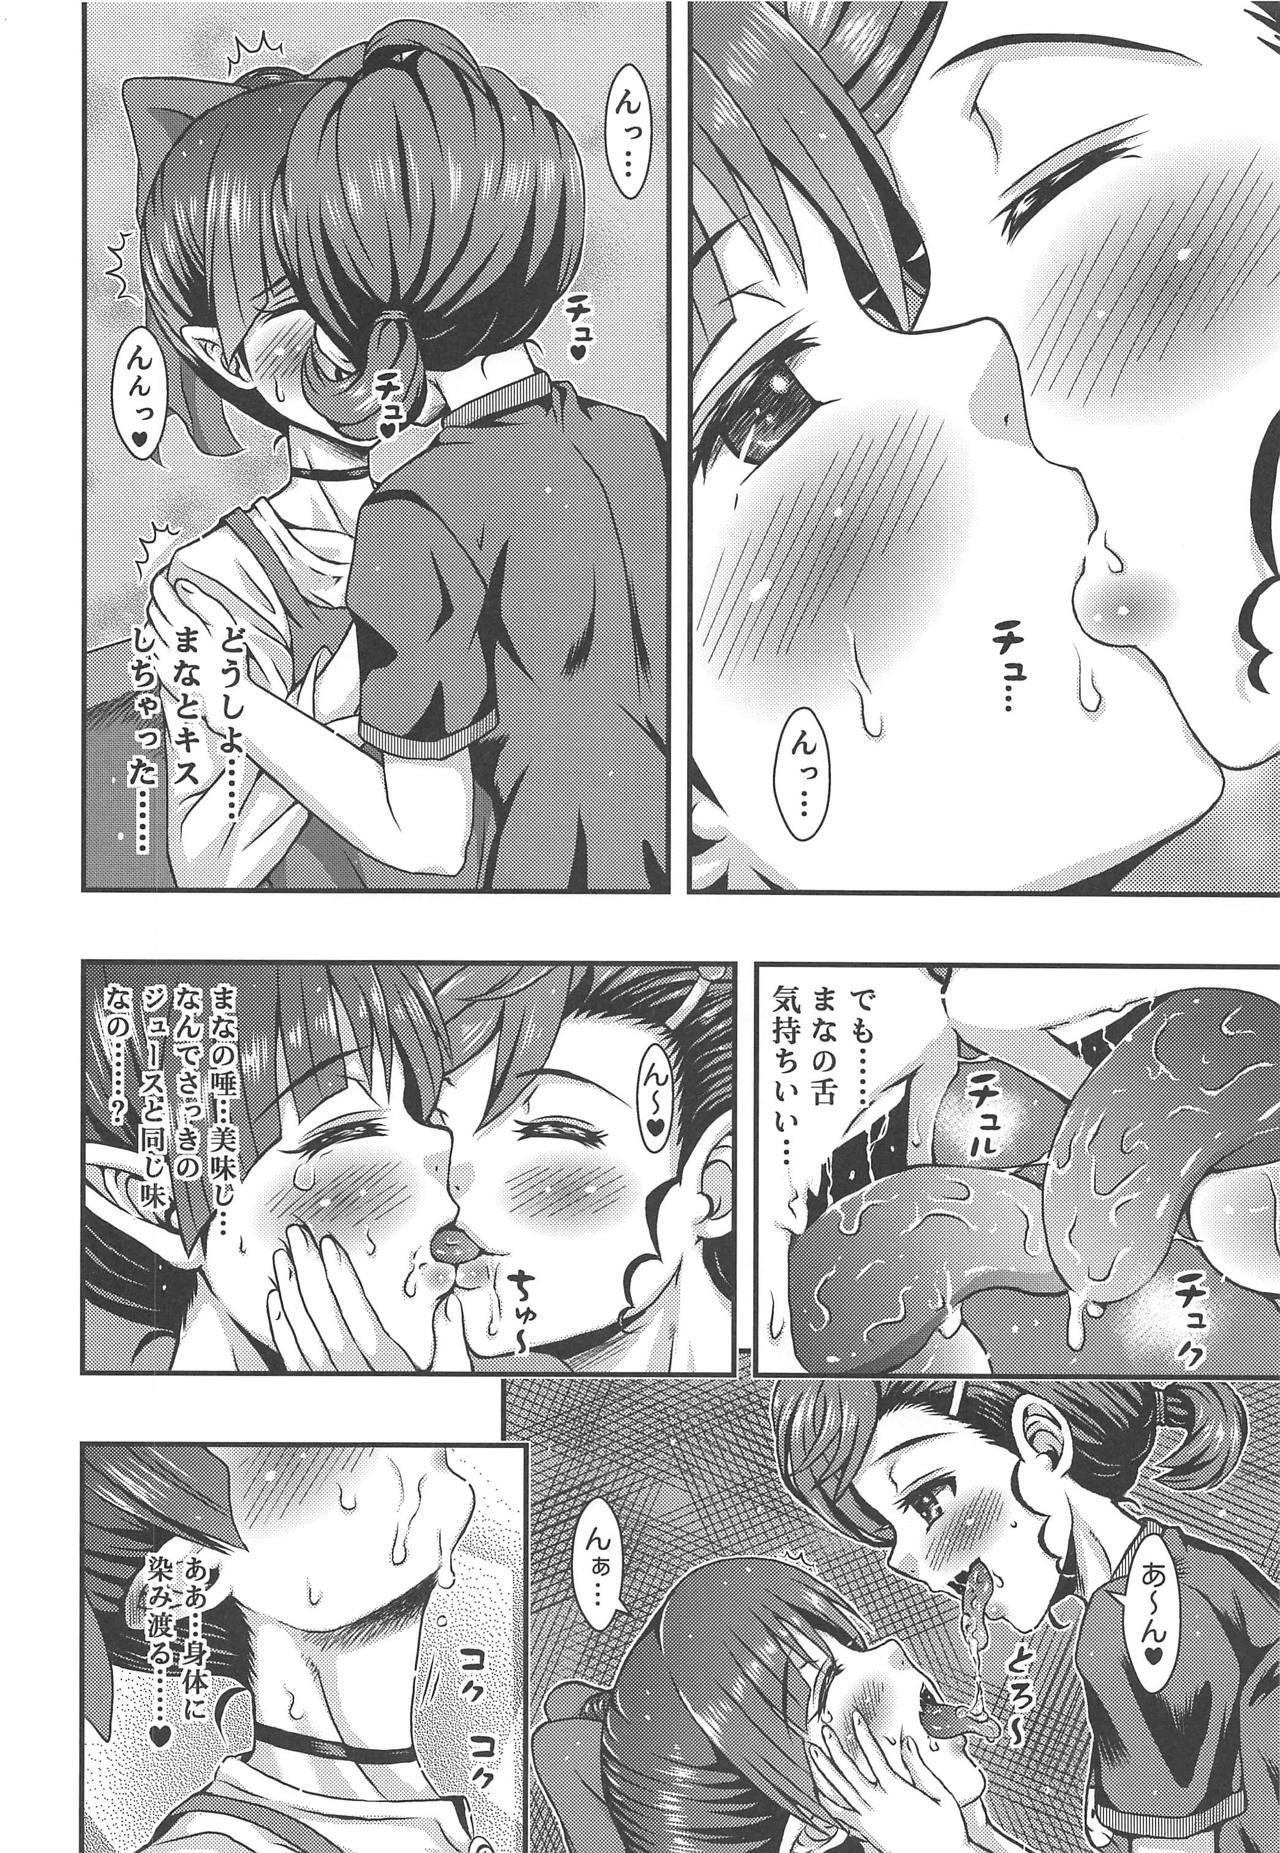 ManaNeko no Naka 6